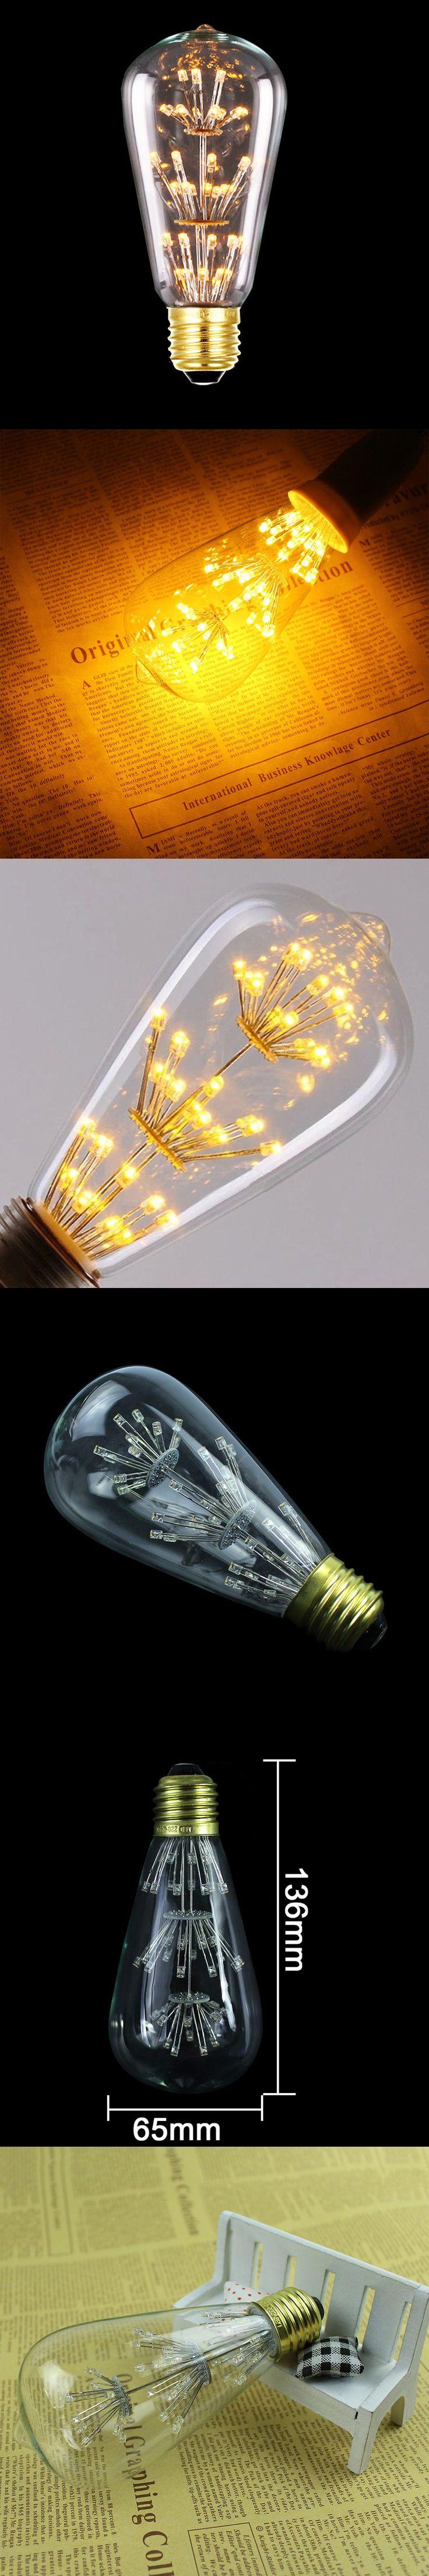 905 best dream light u0026 fire images on pinterest lights box and